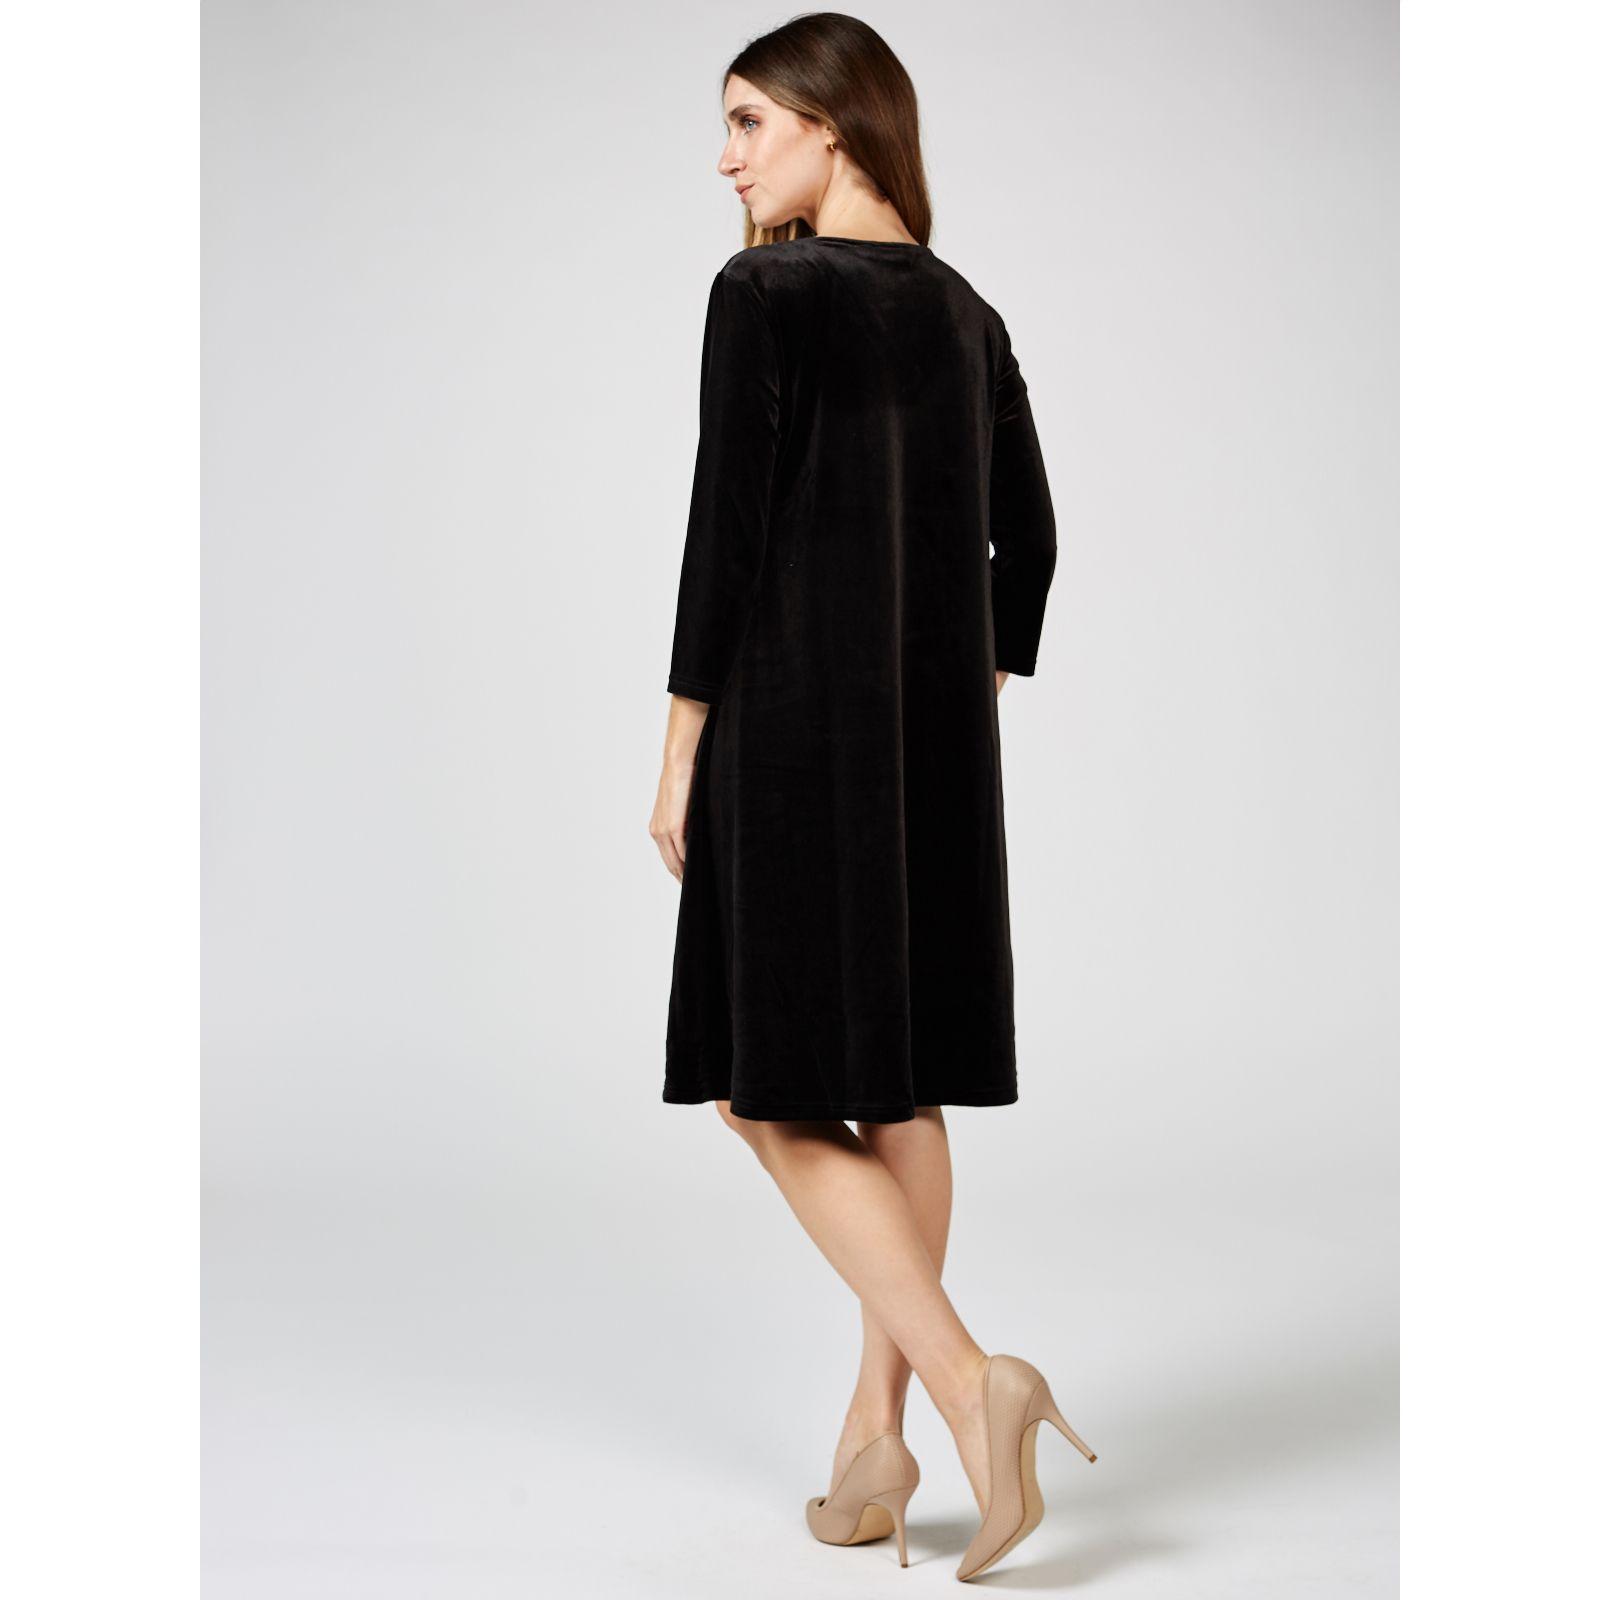 3f8099d5bd9 Velvet Trapeze Dress by Nina Leonard - QVC UK